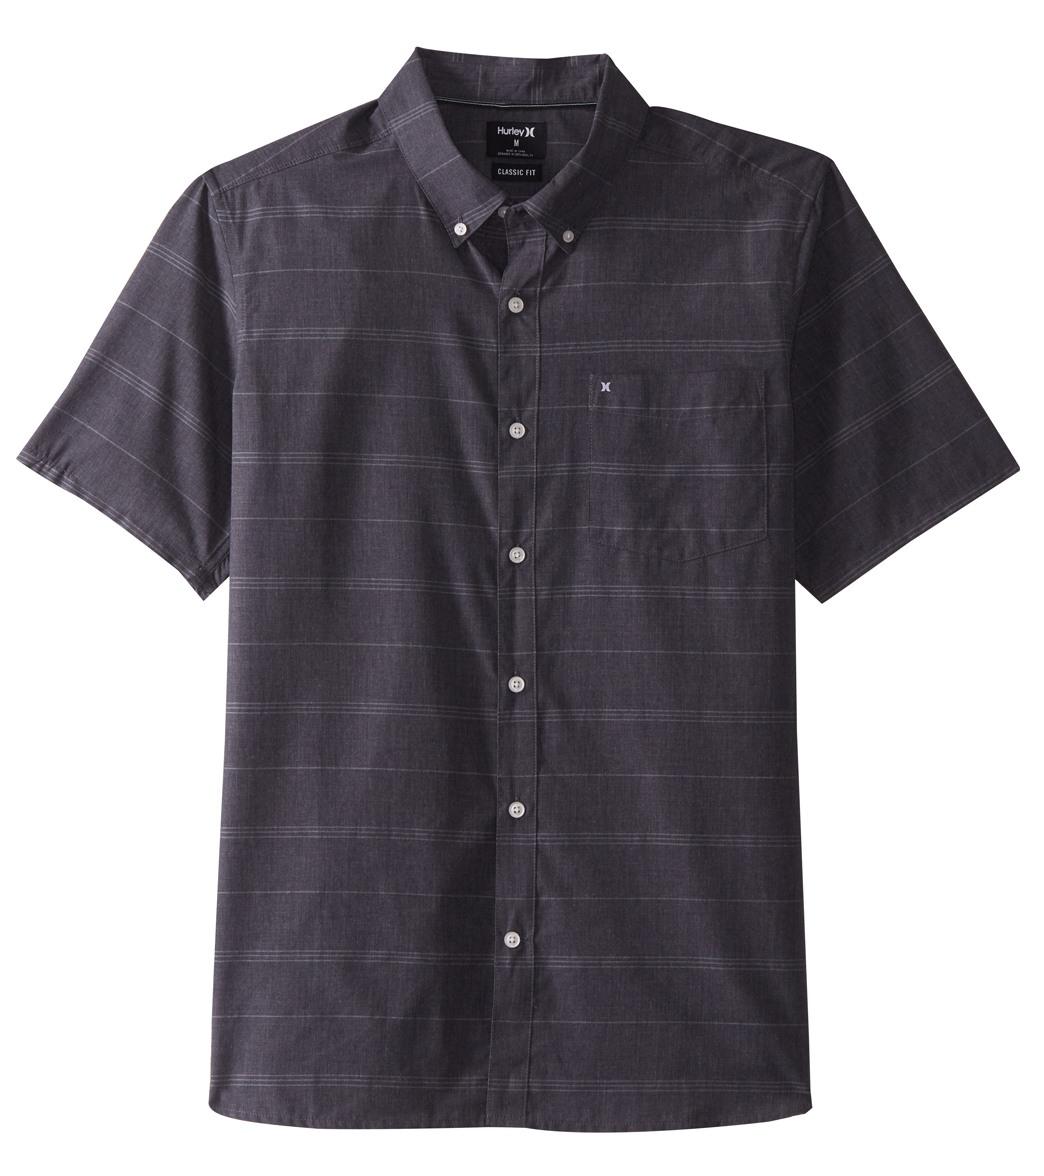 64a0906428 Hurley Men s Dri-FIT Rhythm Short Sleeve Woven Shirt at SwimOutlet.com -  Free Shipping